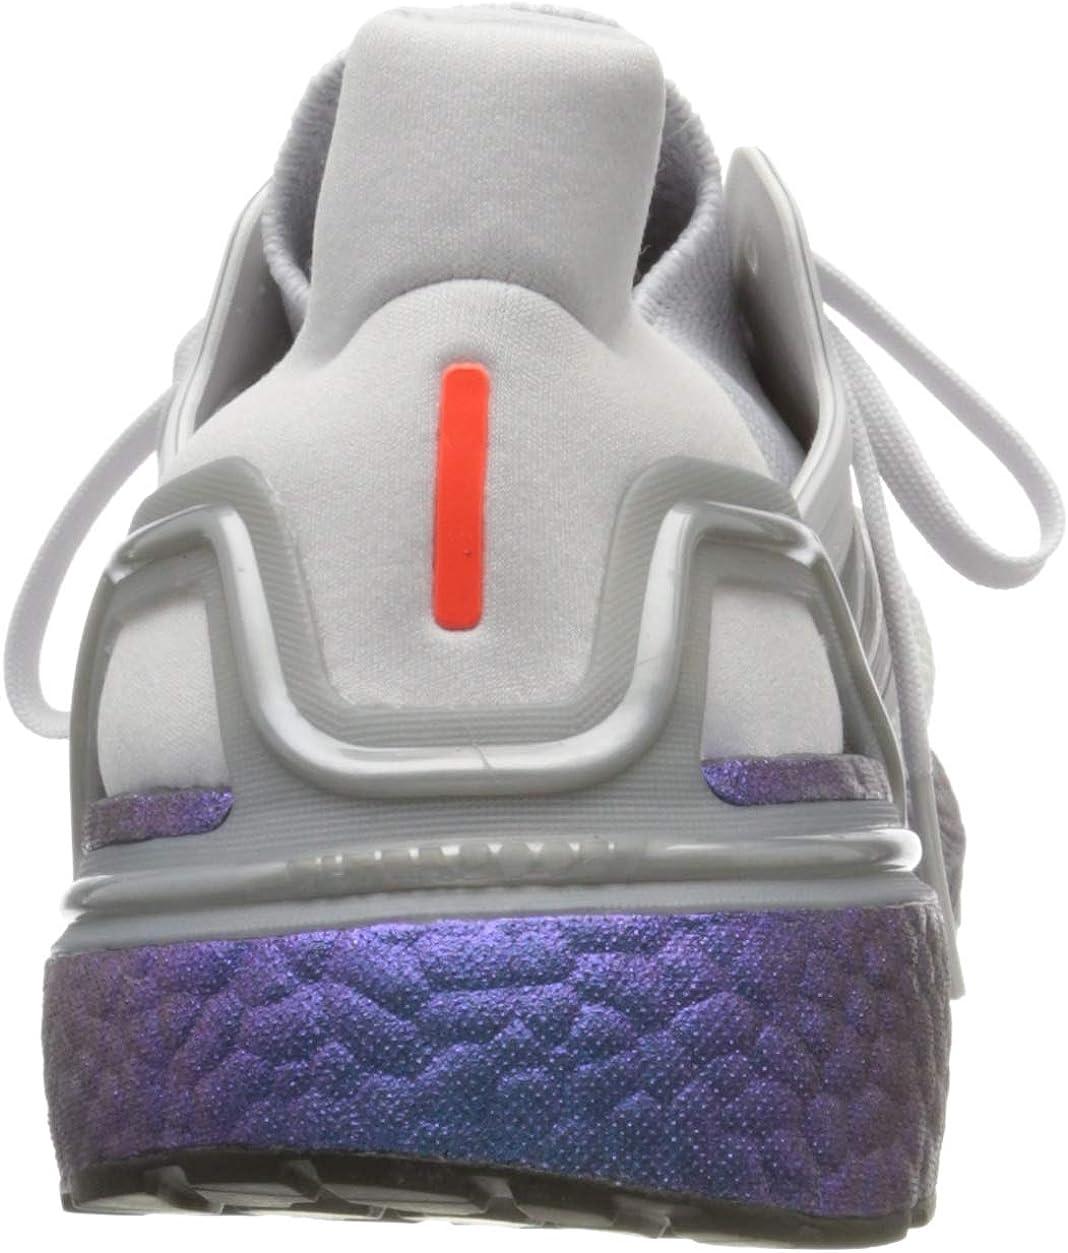 Adidas RNG Ultraboost 20 W, Zapatillas para Correr para Mujer Dash Grey Grey Three F17 Boost Blue Violet Met